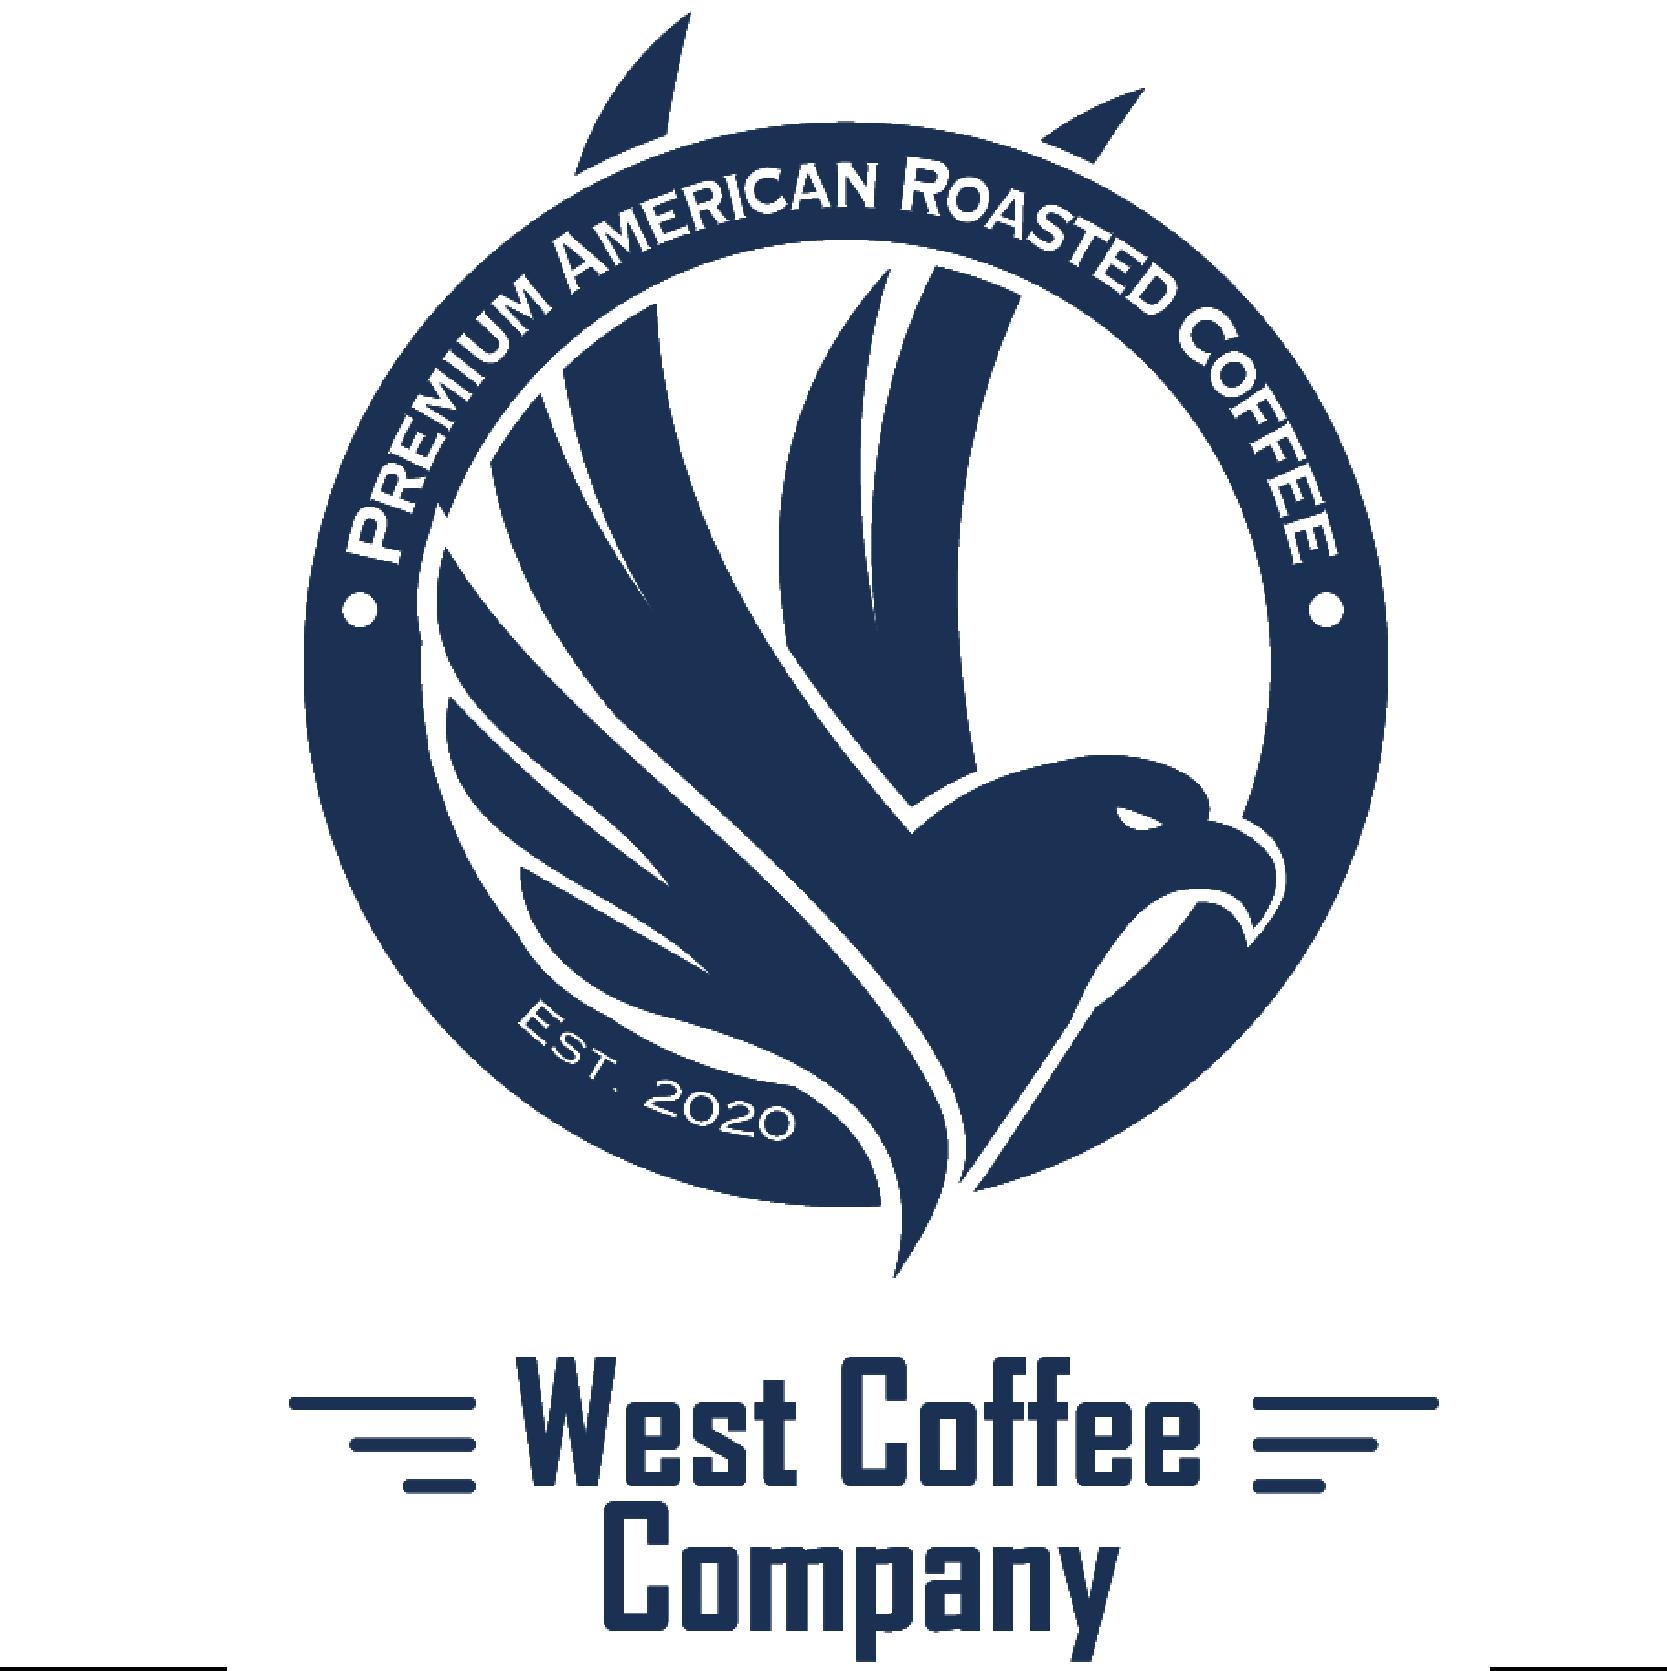 West Coffee Company